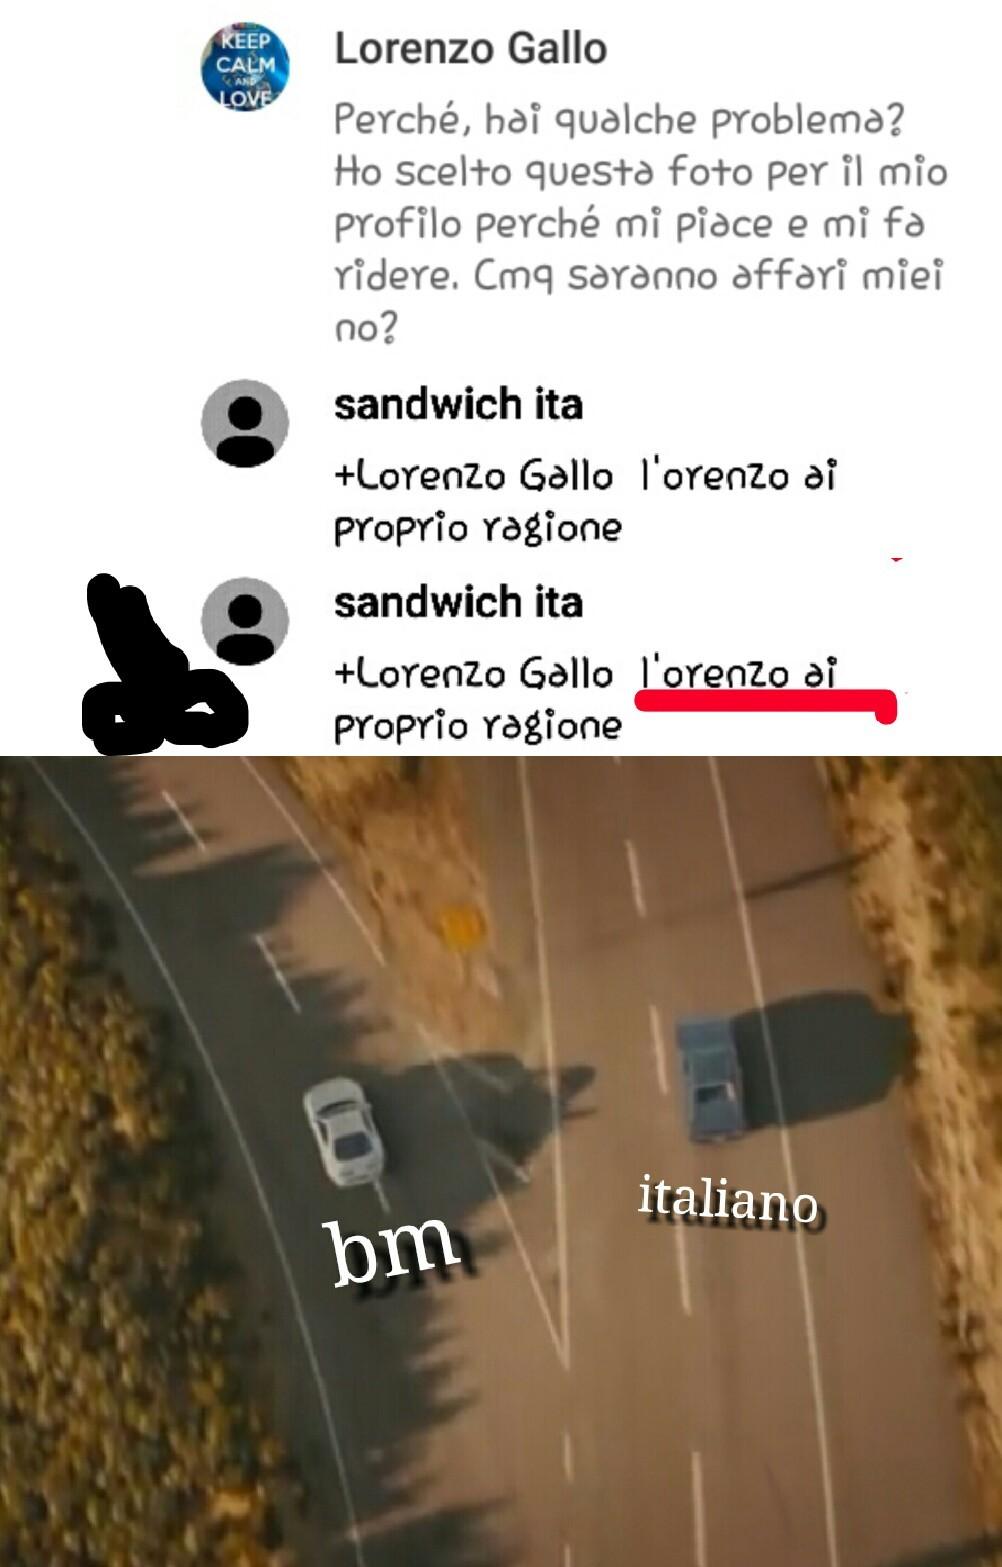 bm - meme